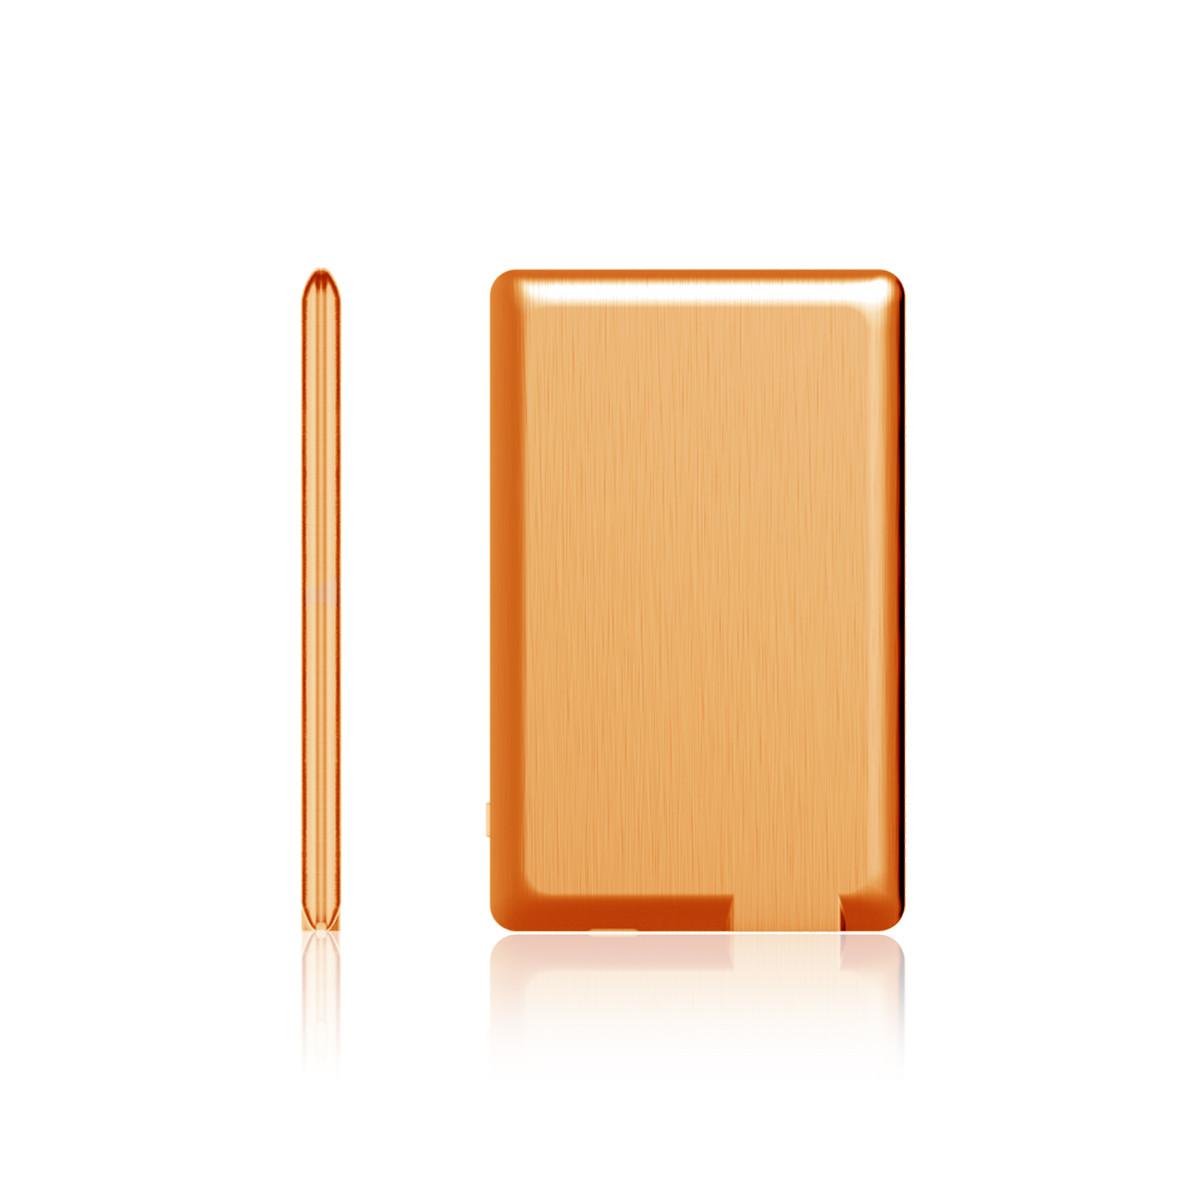 Внешн. порт.аккум. Батарея XOOPAR - POWER CARD(Li-Pol,1300мА*ч,оранж,microUSB/USB-каб, LED), XP61057